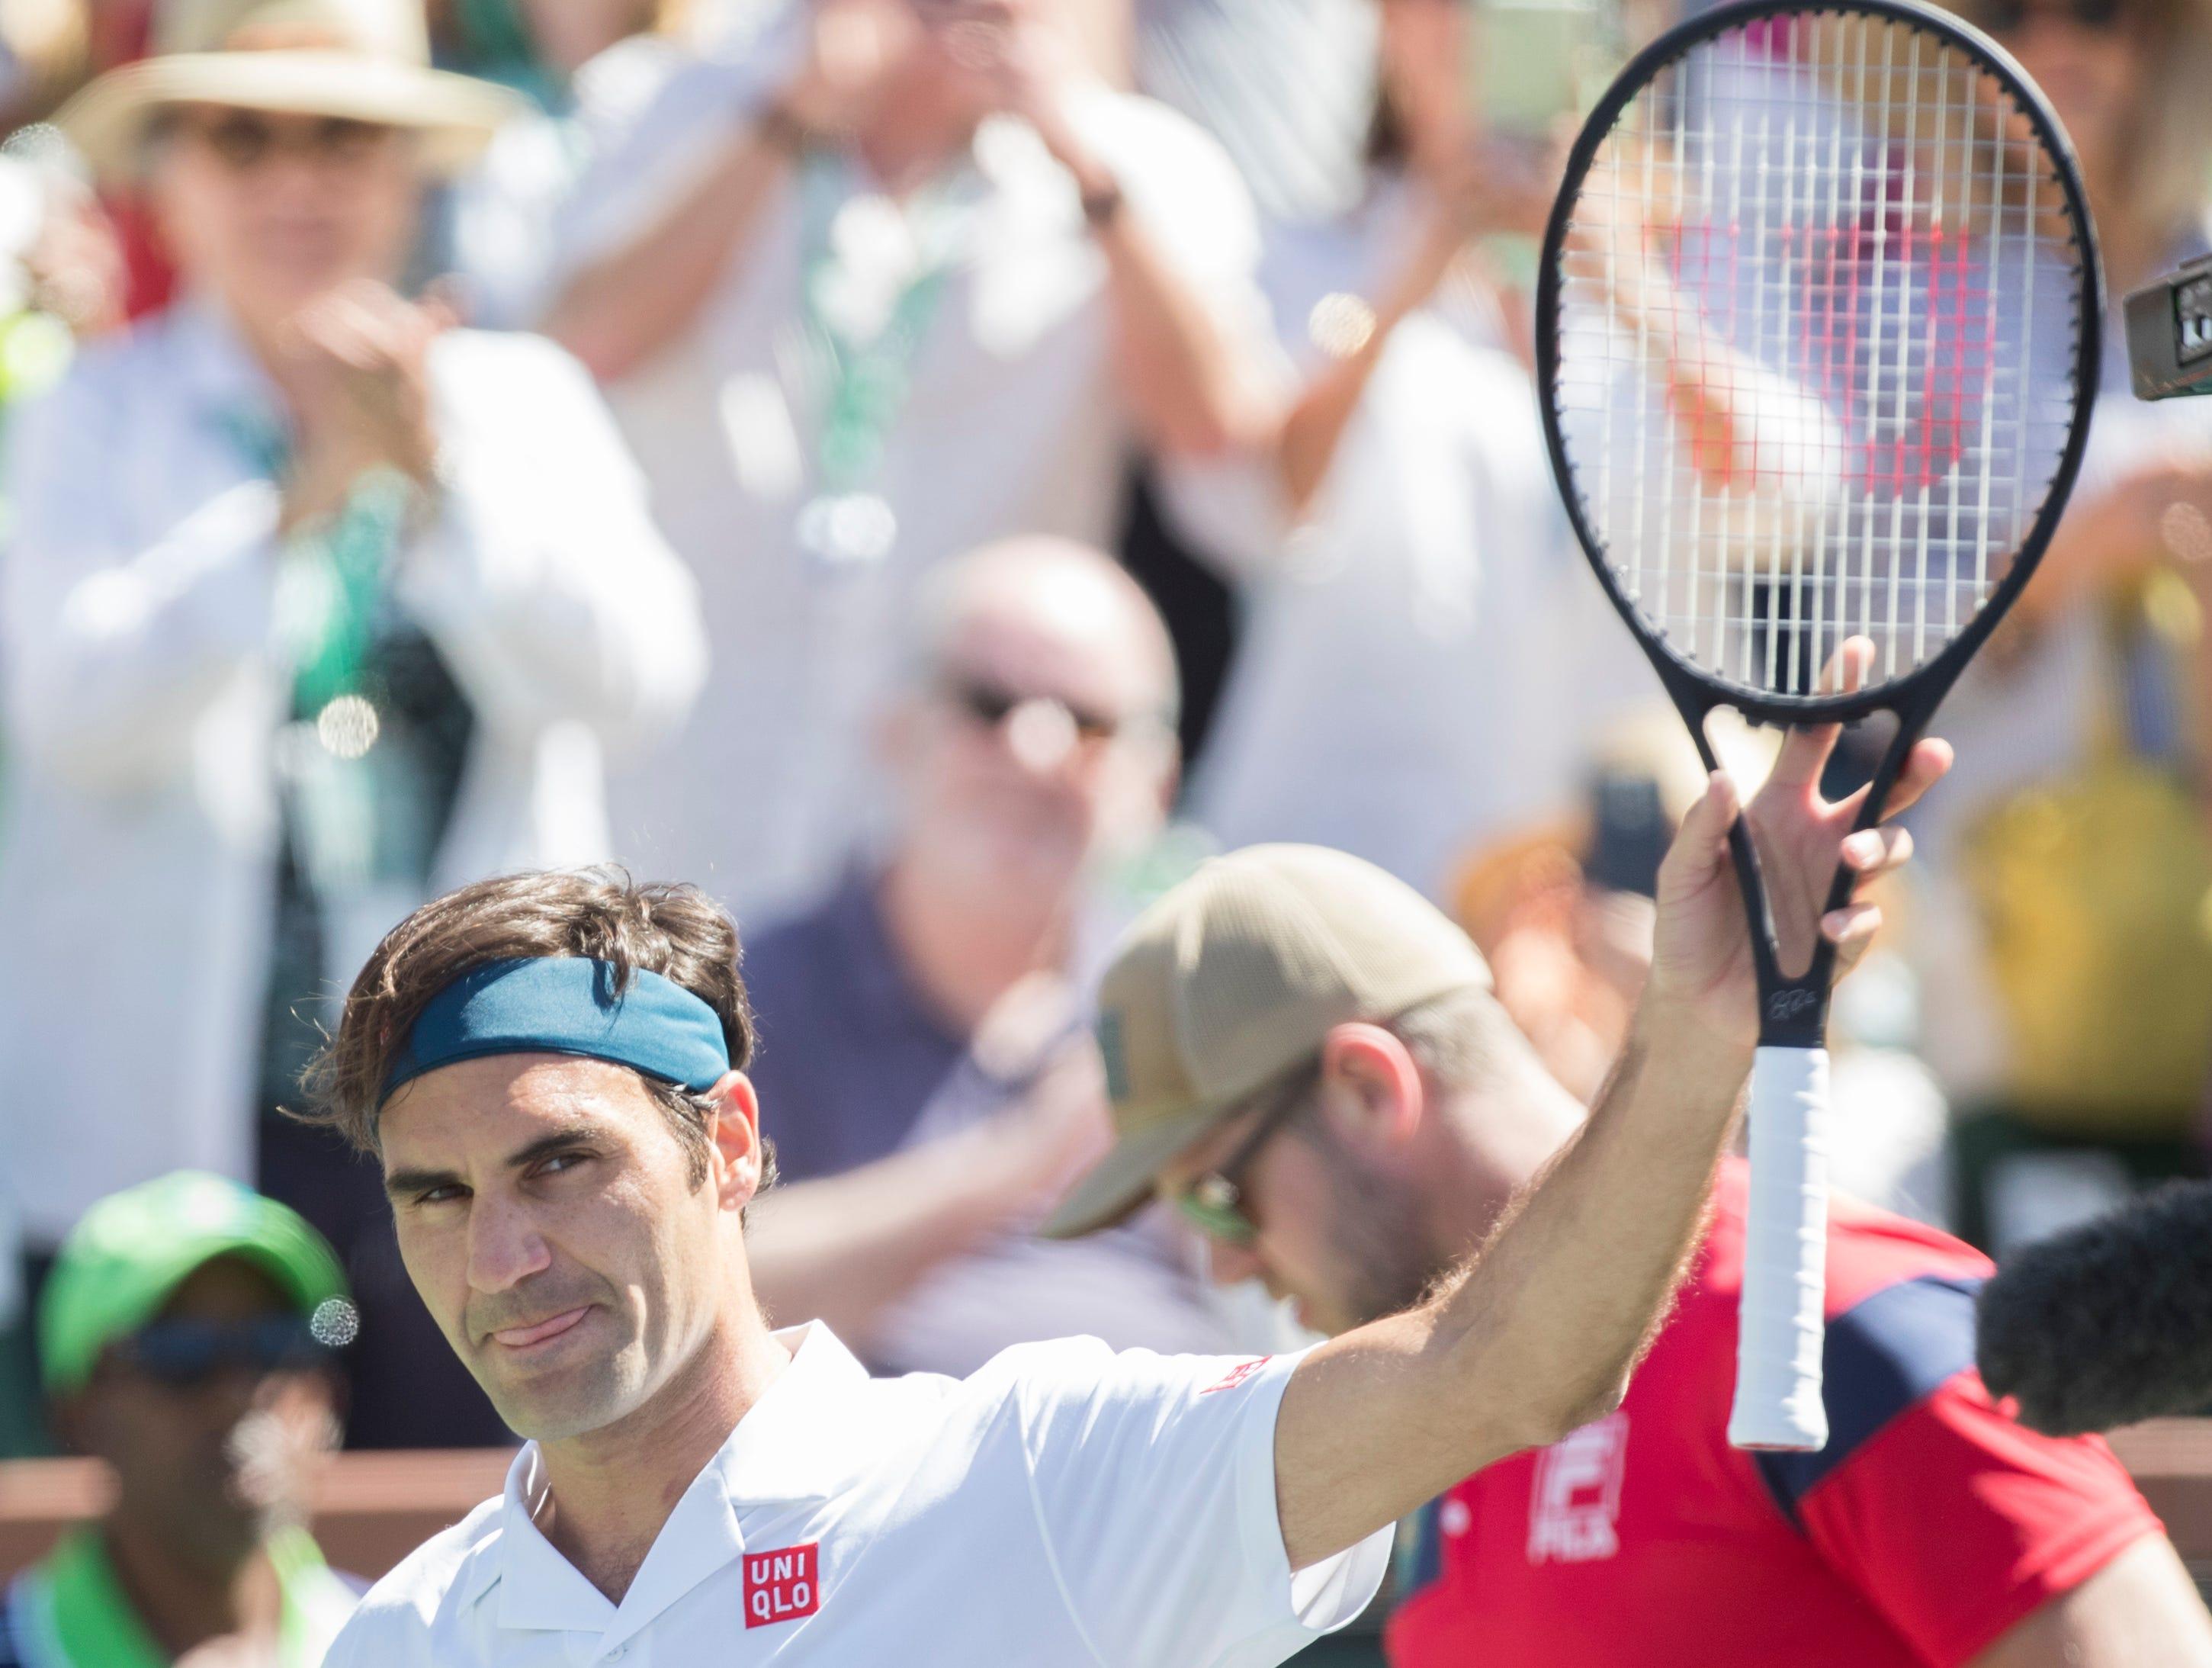 Roger Federer during his quarterfinal match against Hubert Hurkacz on Stadium One at the 2019 BNP Paribas Open at Indian Wells Tennis Garden on March 15, 2019. Federer won 6-4, 6-4.